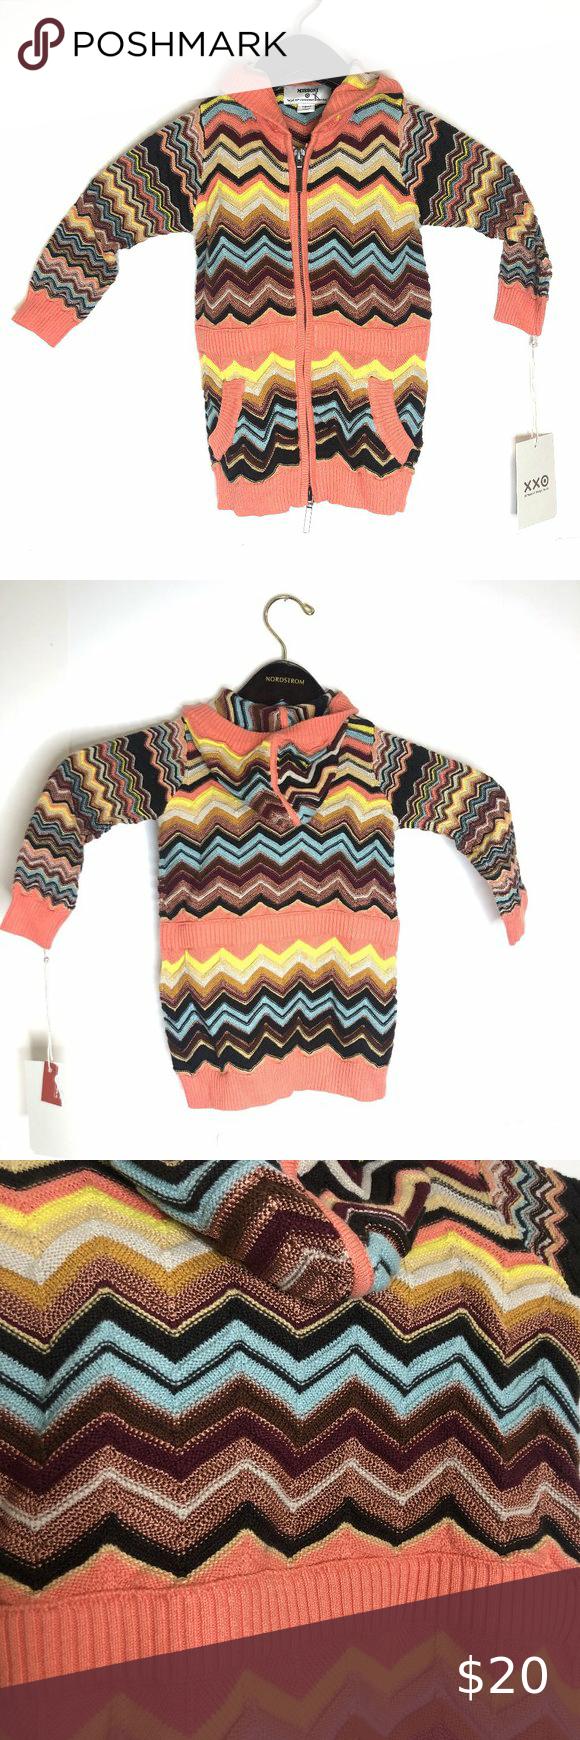 Missoni GIRLS Knit Sweater Skirt w// pockets NEW Blue Colore Chevron